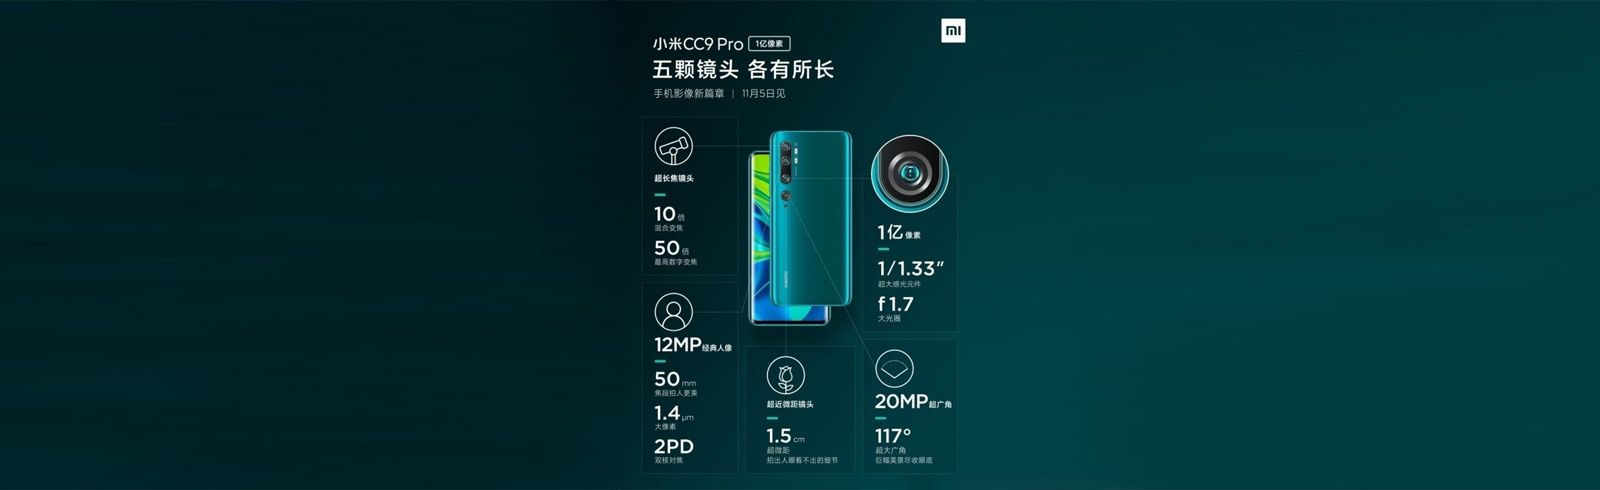 Xiaomi Mi CC9 Pro appears on TENAA, will launch globally as Xiaomi Mi Note 10